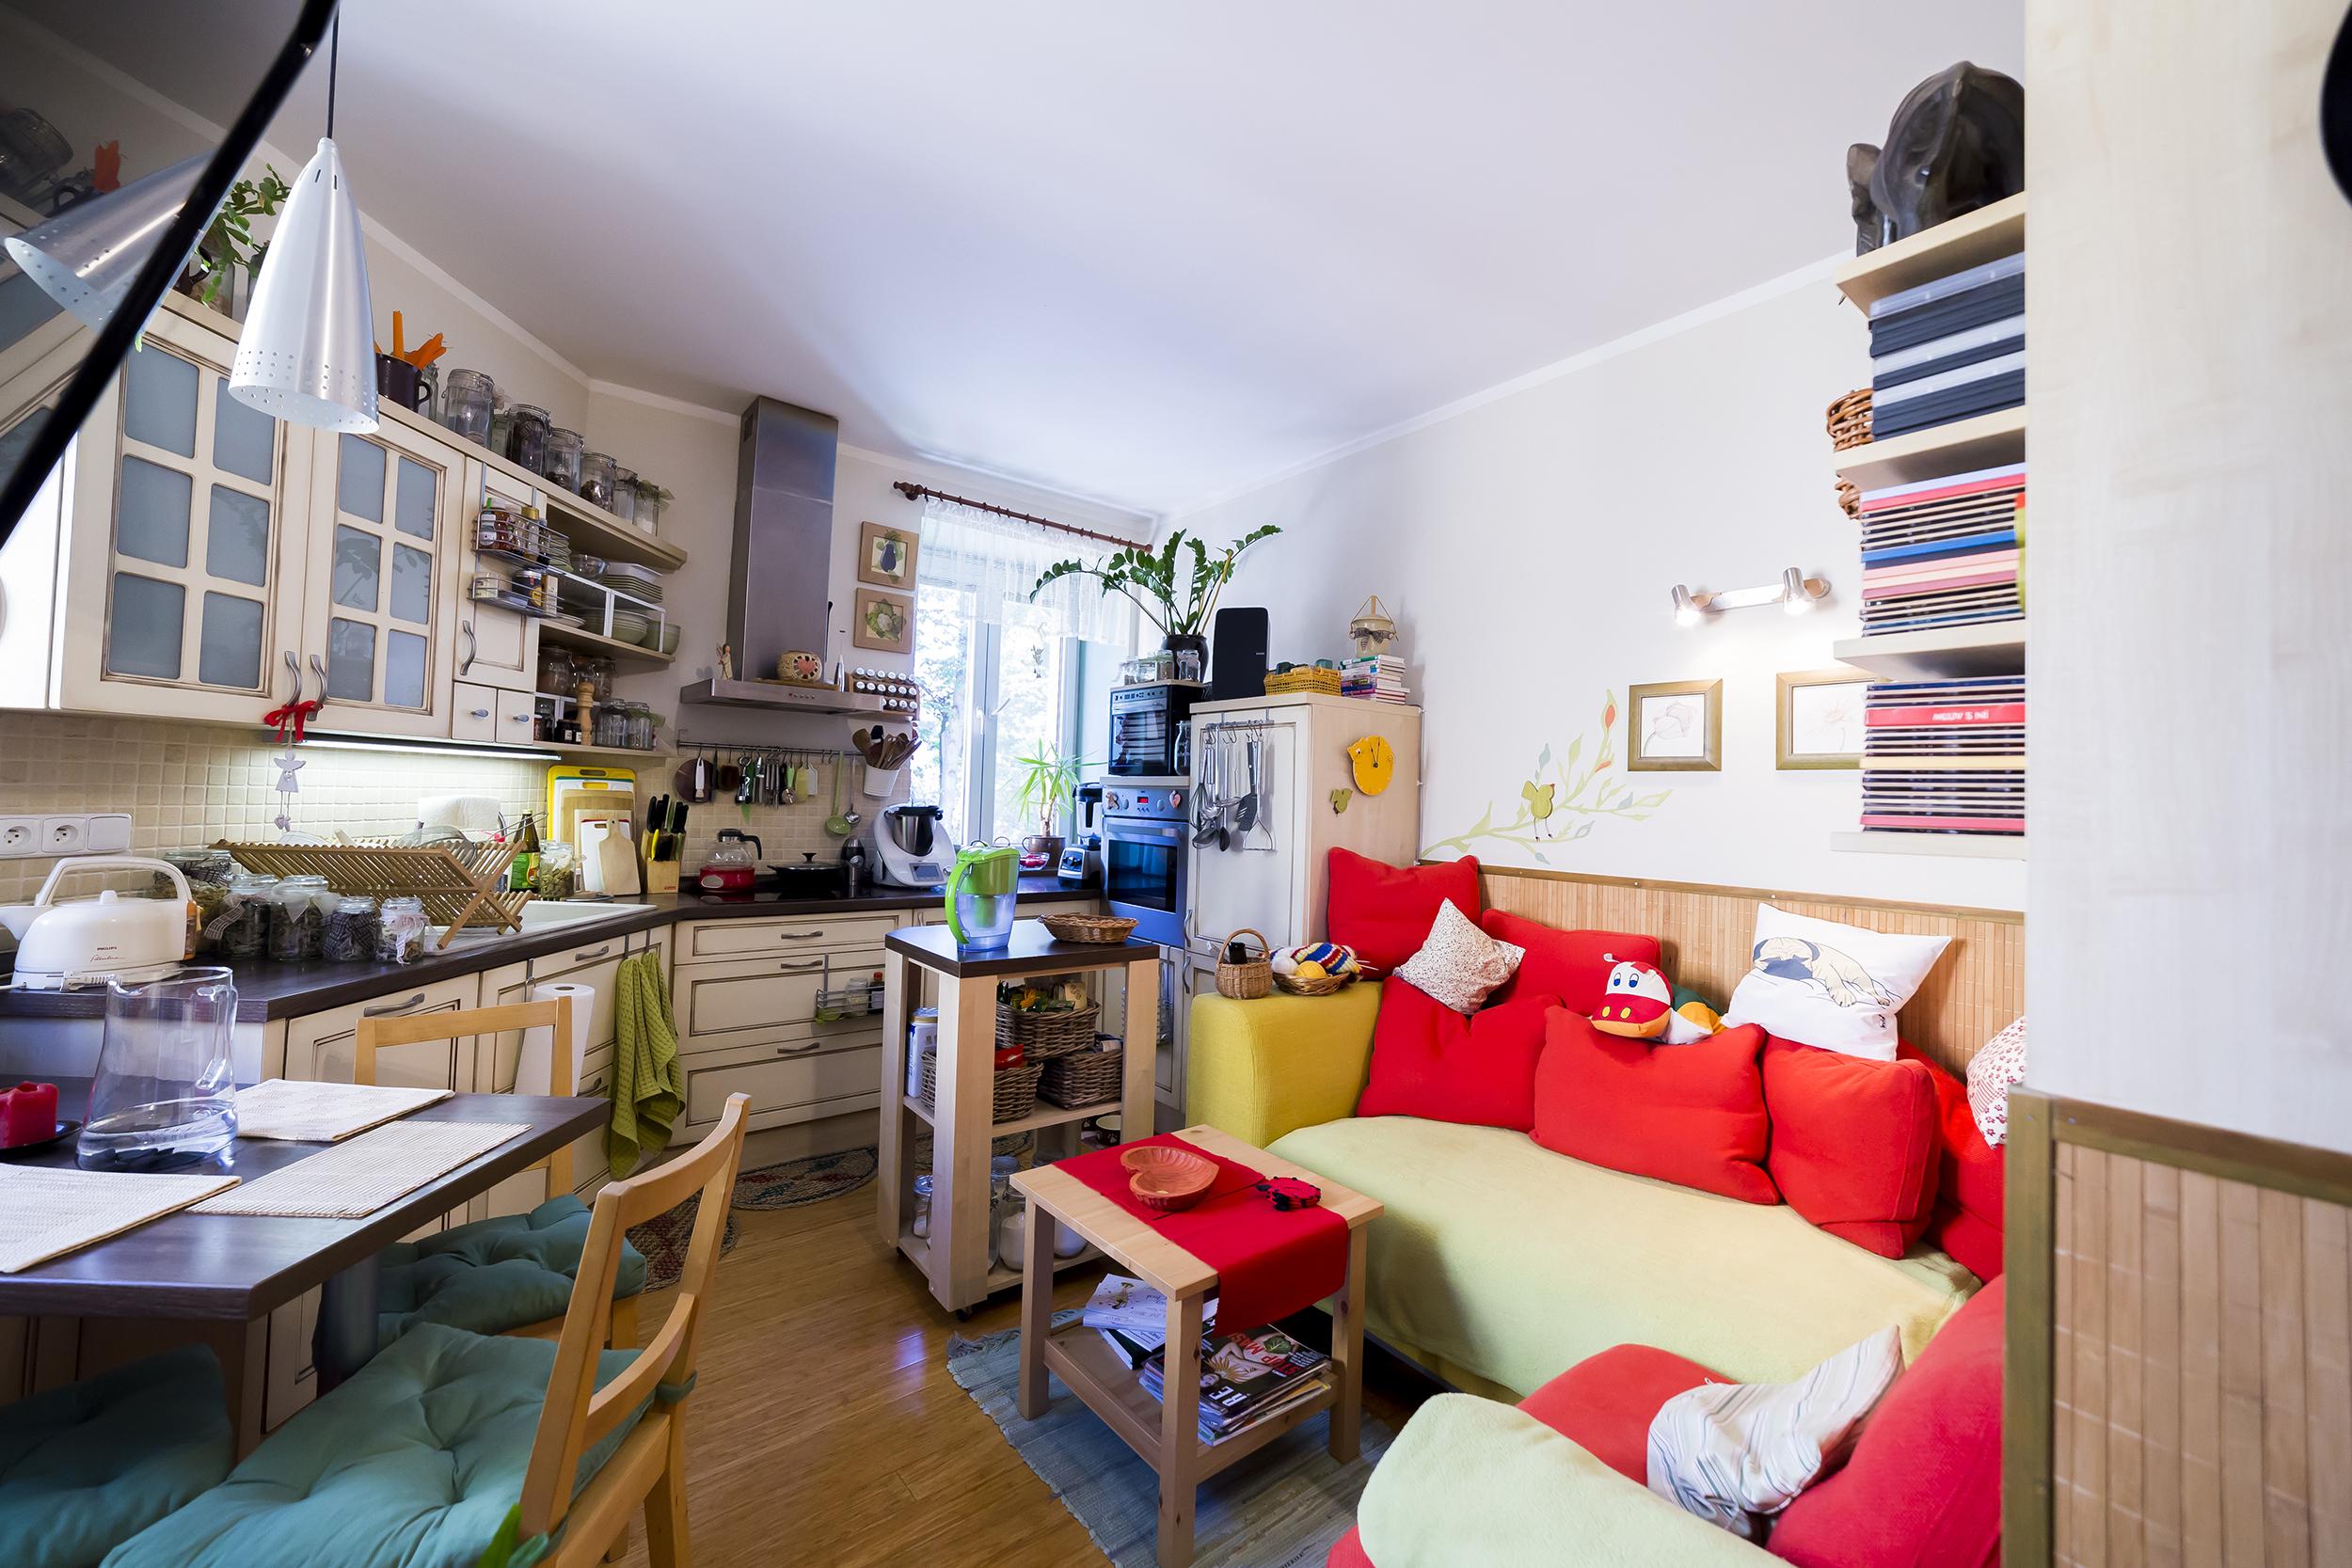 opava reality knihy sedacka polstar stul koberec zidle okno digestor svetlo